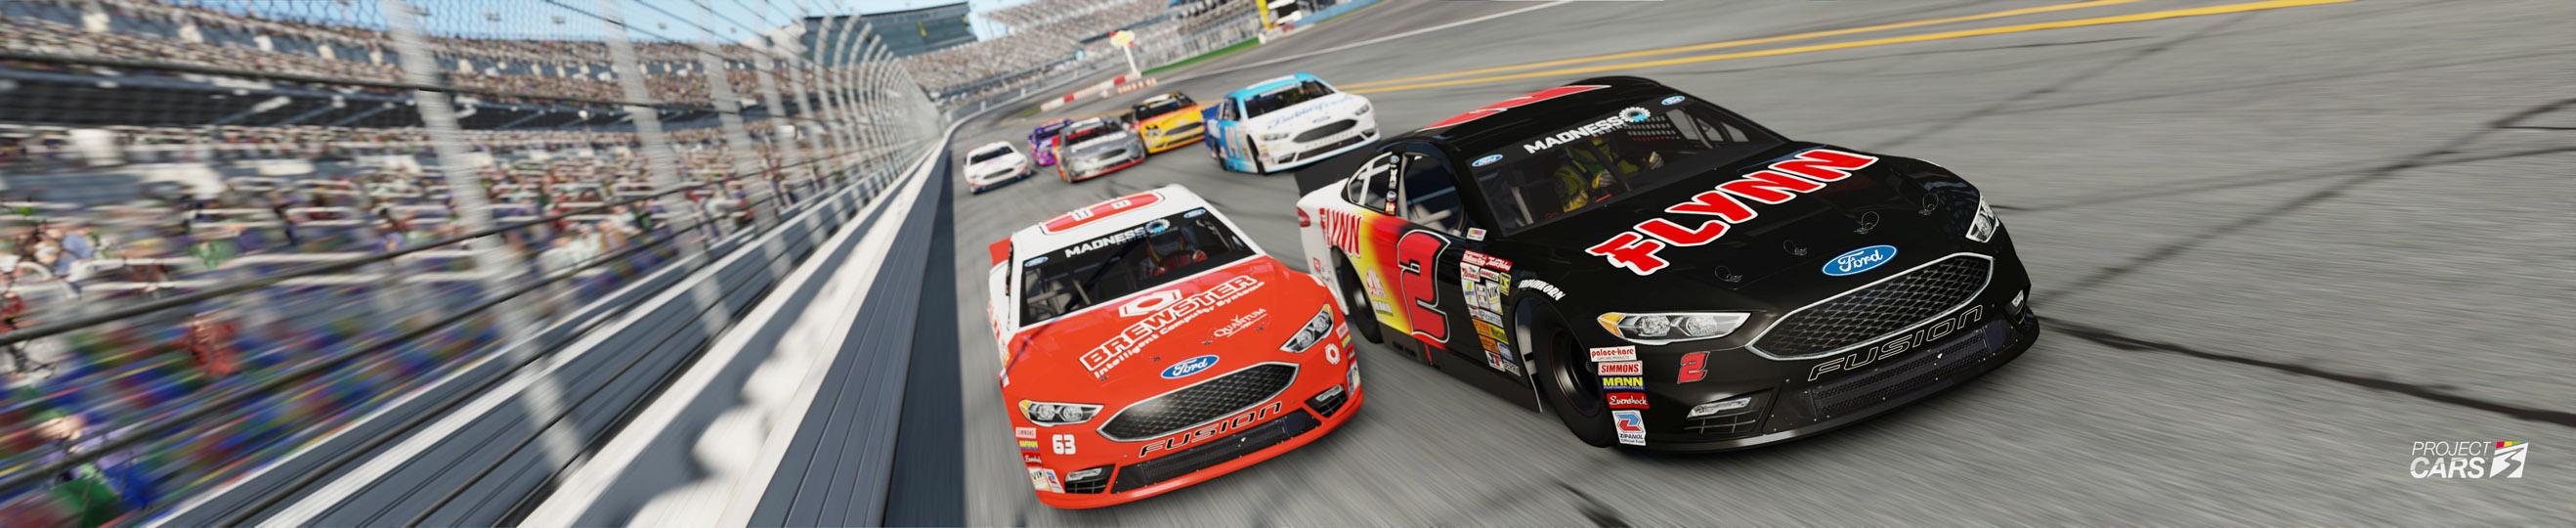 3 PROJECT CARS 3 NASCAR at DAYTONA crop copy.jpg